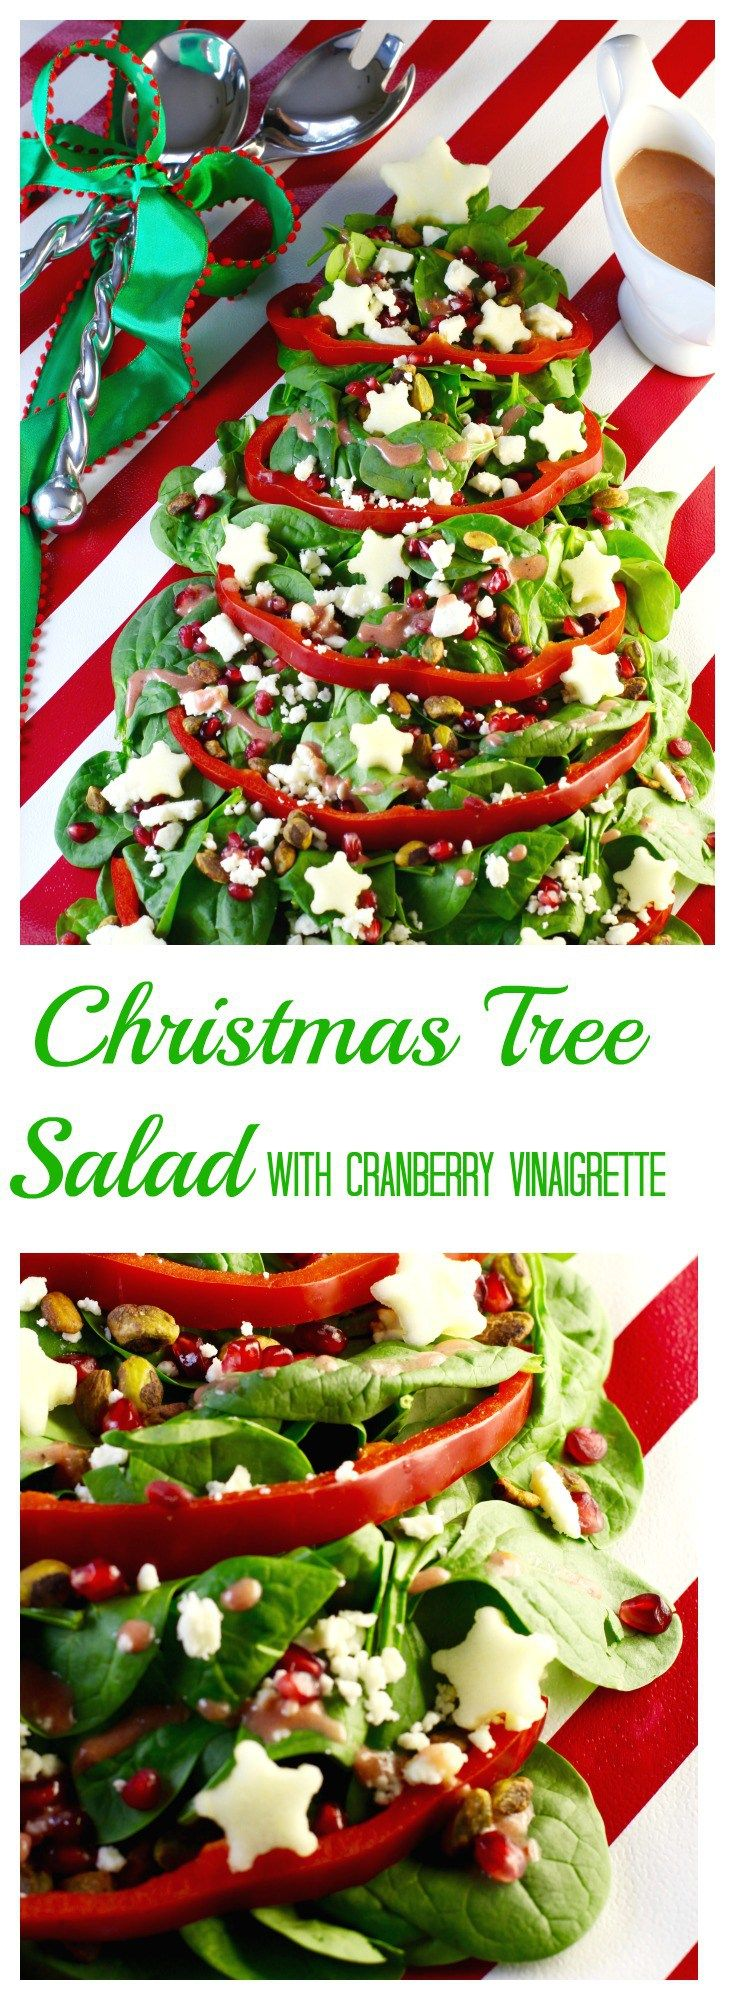 Christmas Eve Food In Spain: Christmas Tree Salad + Cranberry Vinaigrette Dressing